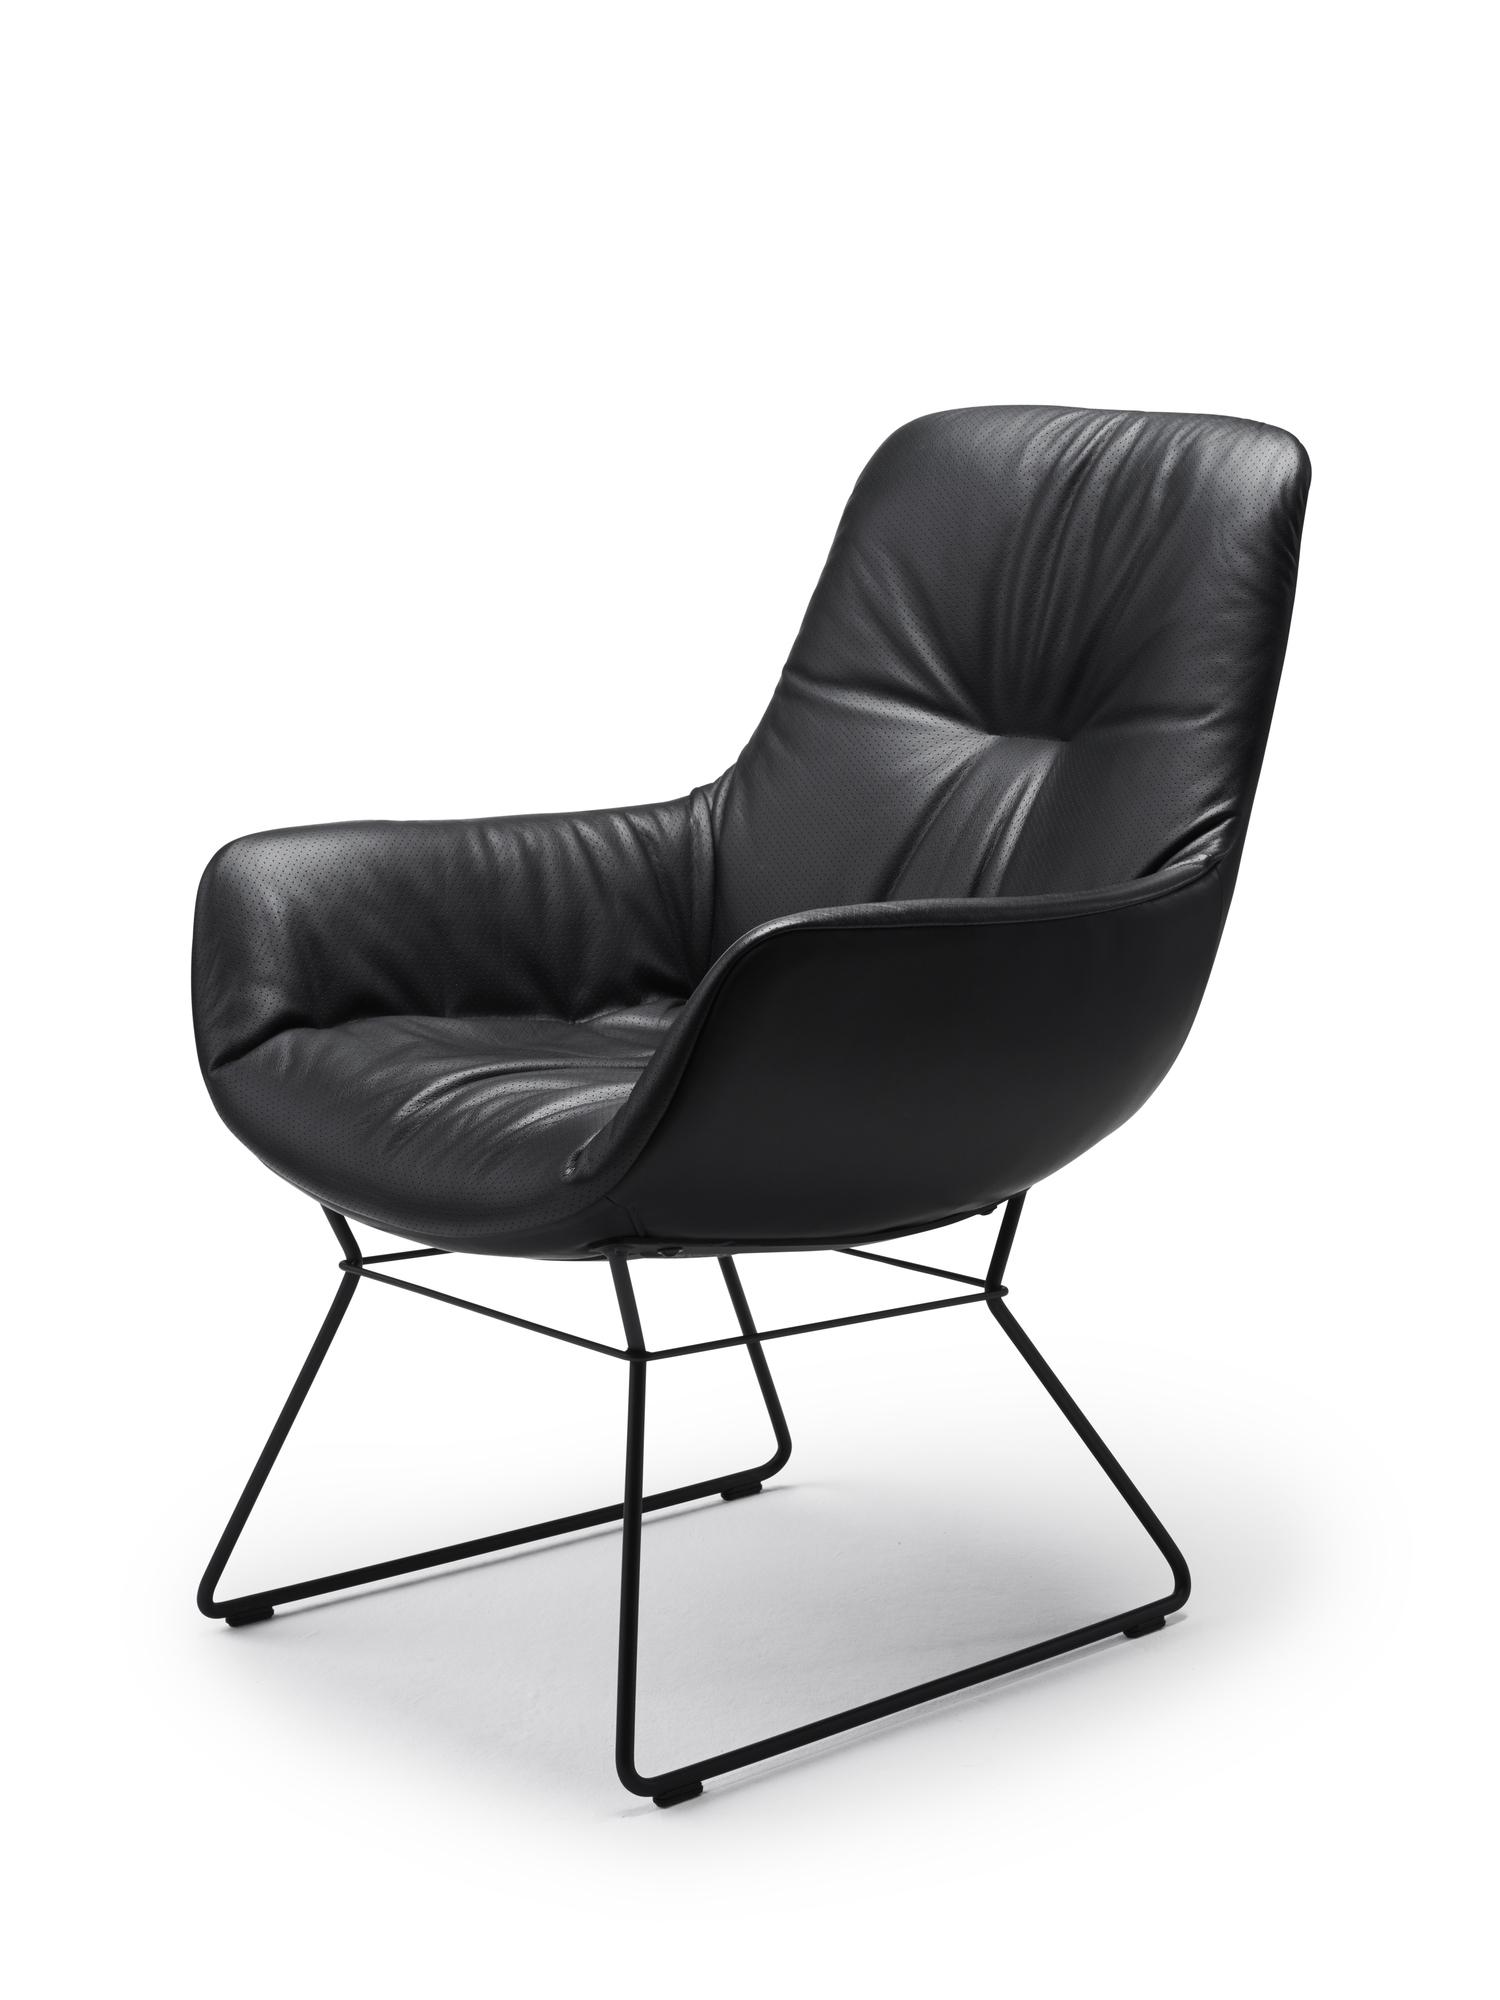 Leya Cocktail Loungesessel Freifrau Sitzmöbelmanufaktur